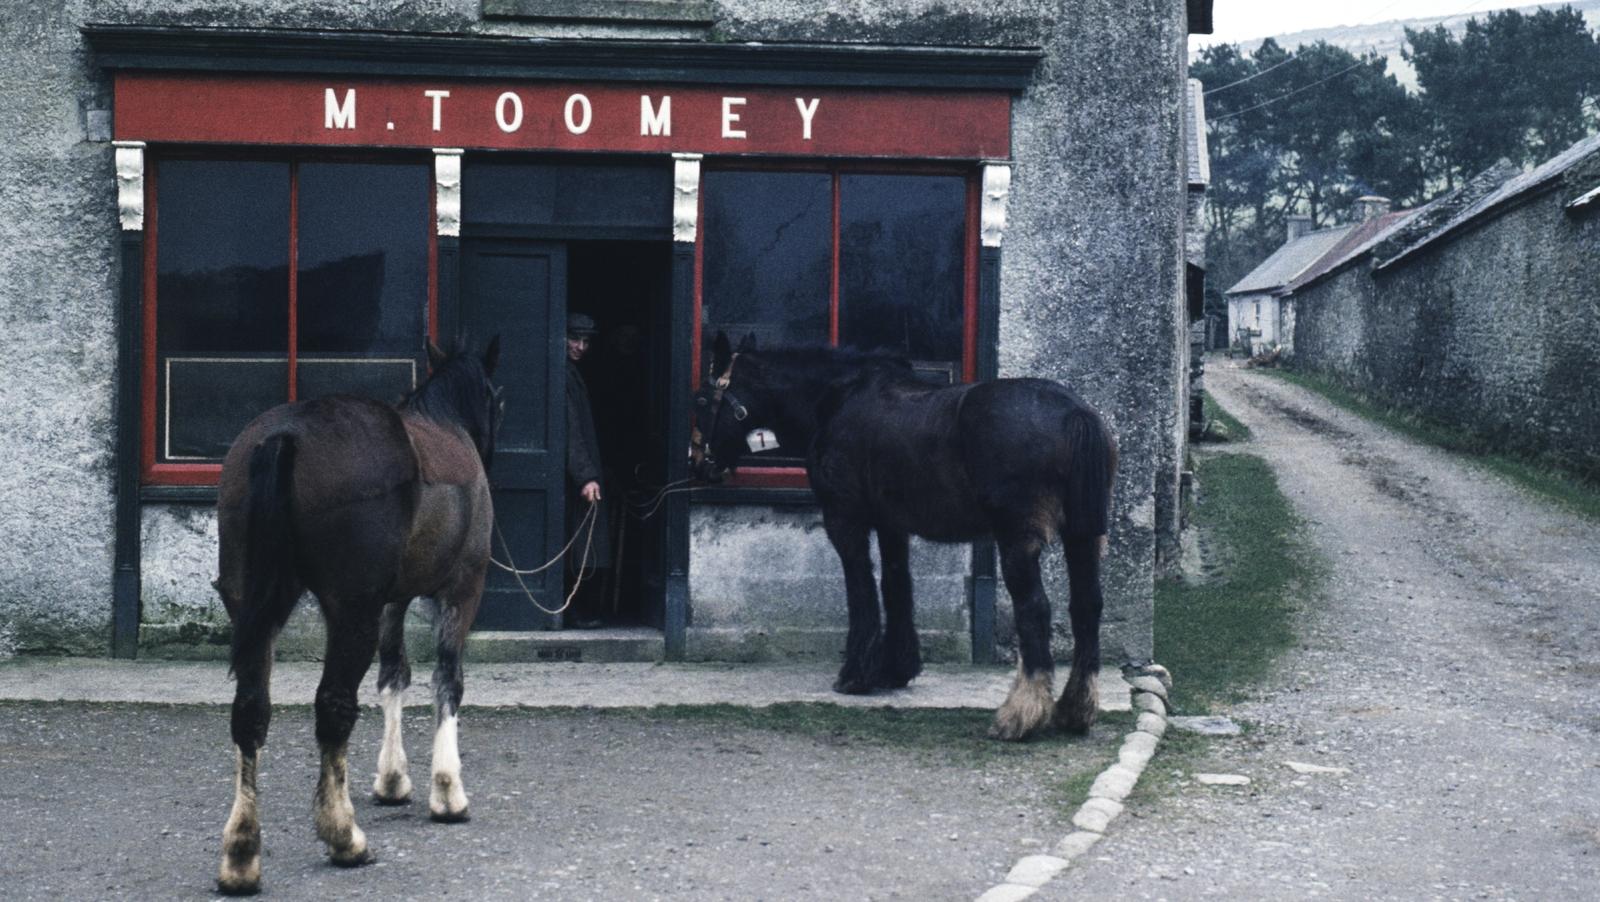 Kilkenny to Abbeyleix - 3 ways to travel via line 491 bus, line 4